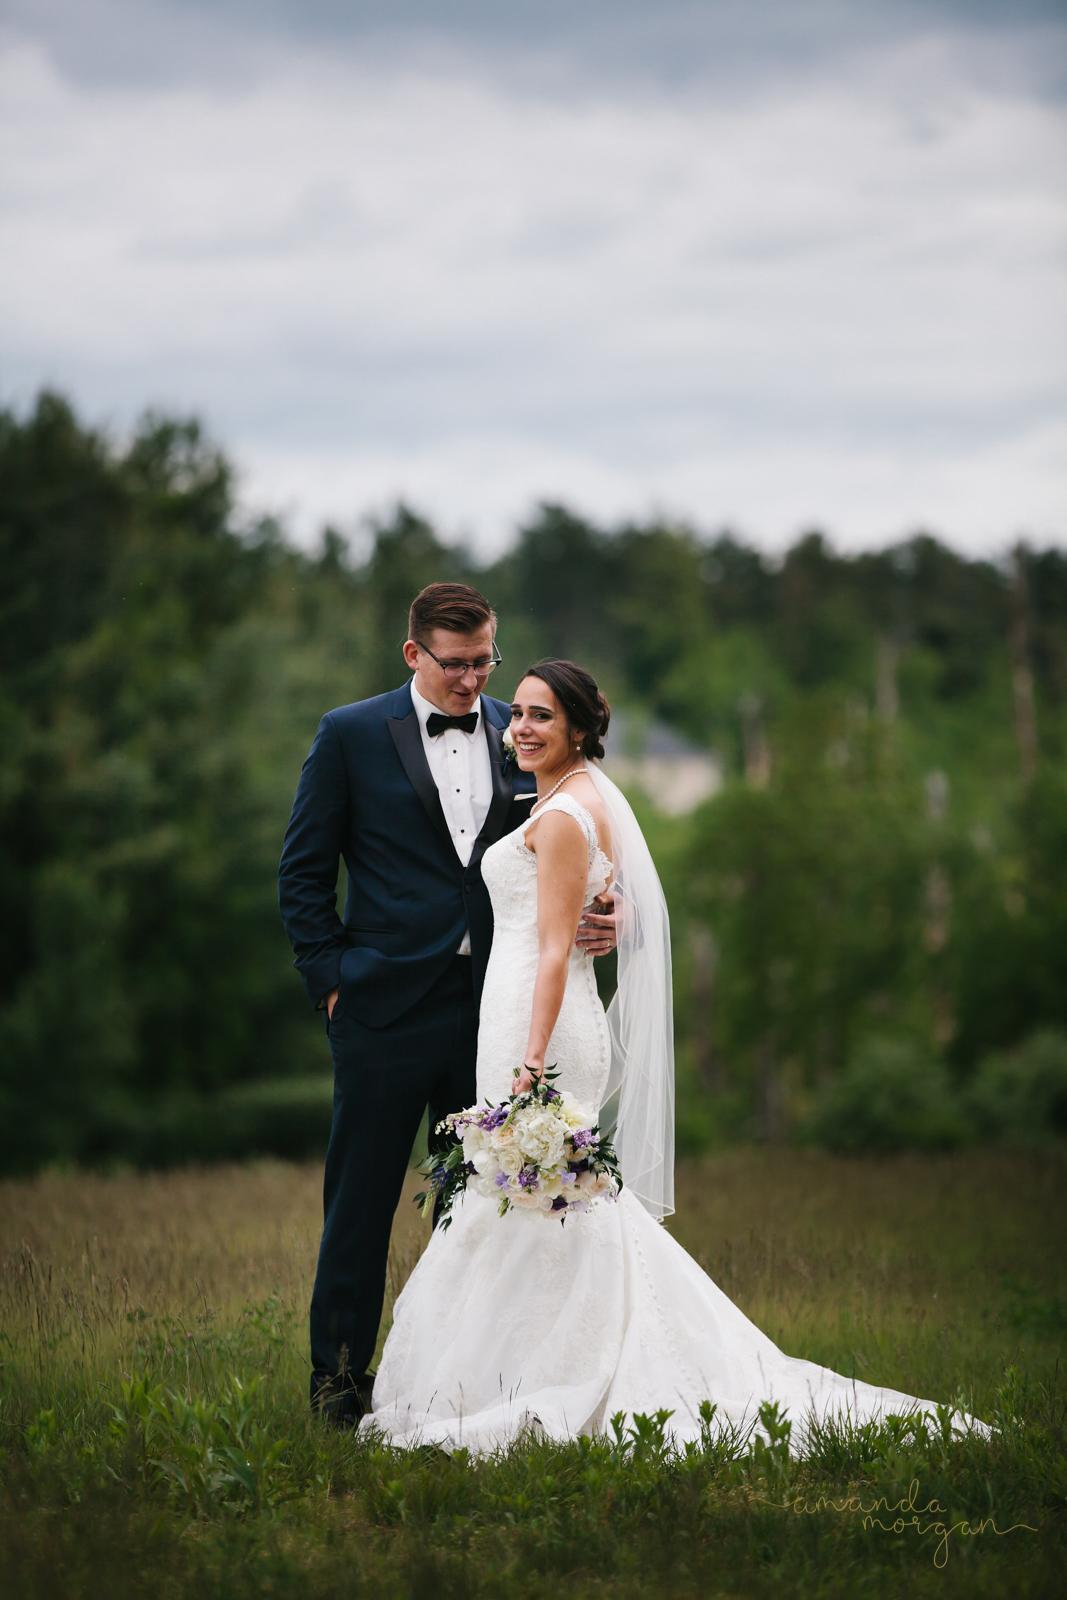 Publick-House-Wedding-Amanda-Morgan-18.jpg